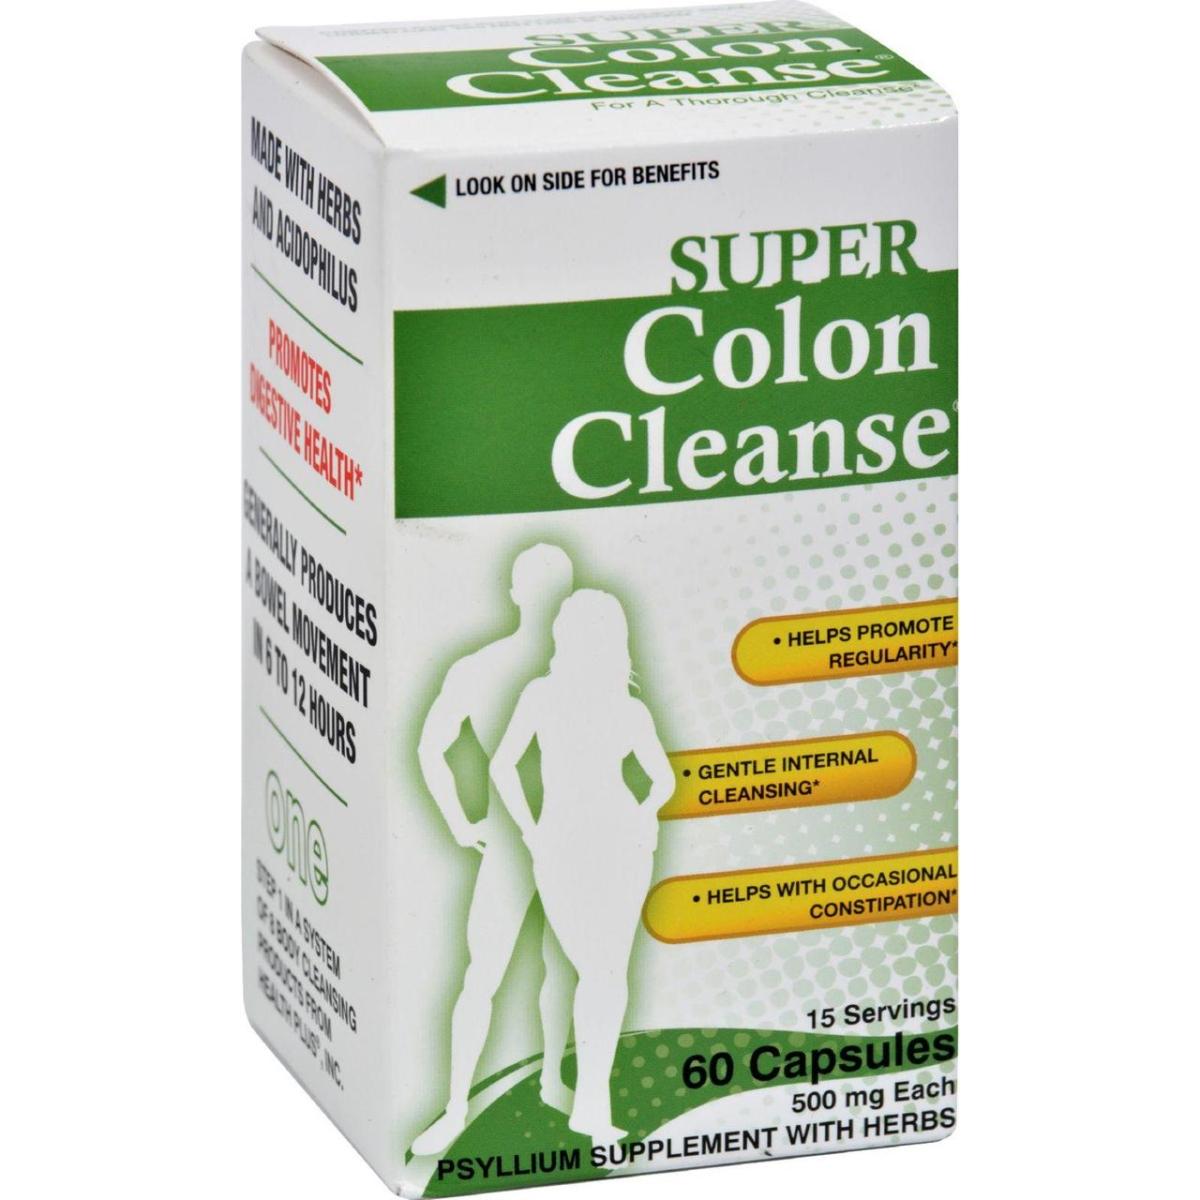 Health Plus HG0560342 Super Colon Cleanse - 60 Capsules